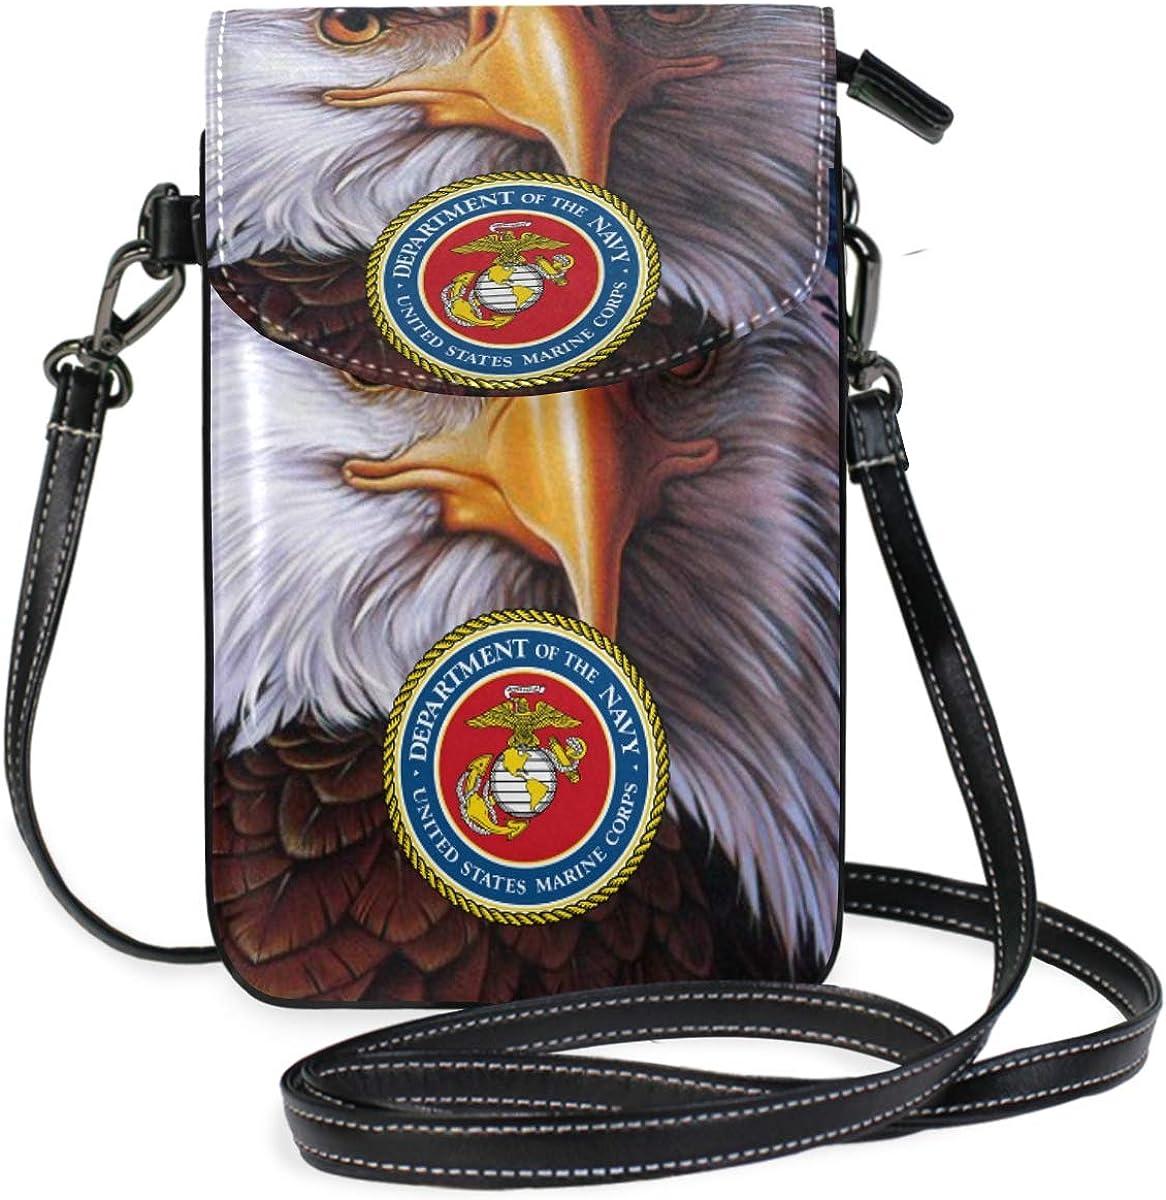 US American Navy USN Mini Crossbody Cellphone Purse PU Leather Shoulder Bags Wallet Pouch Handbag